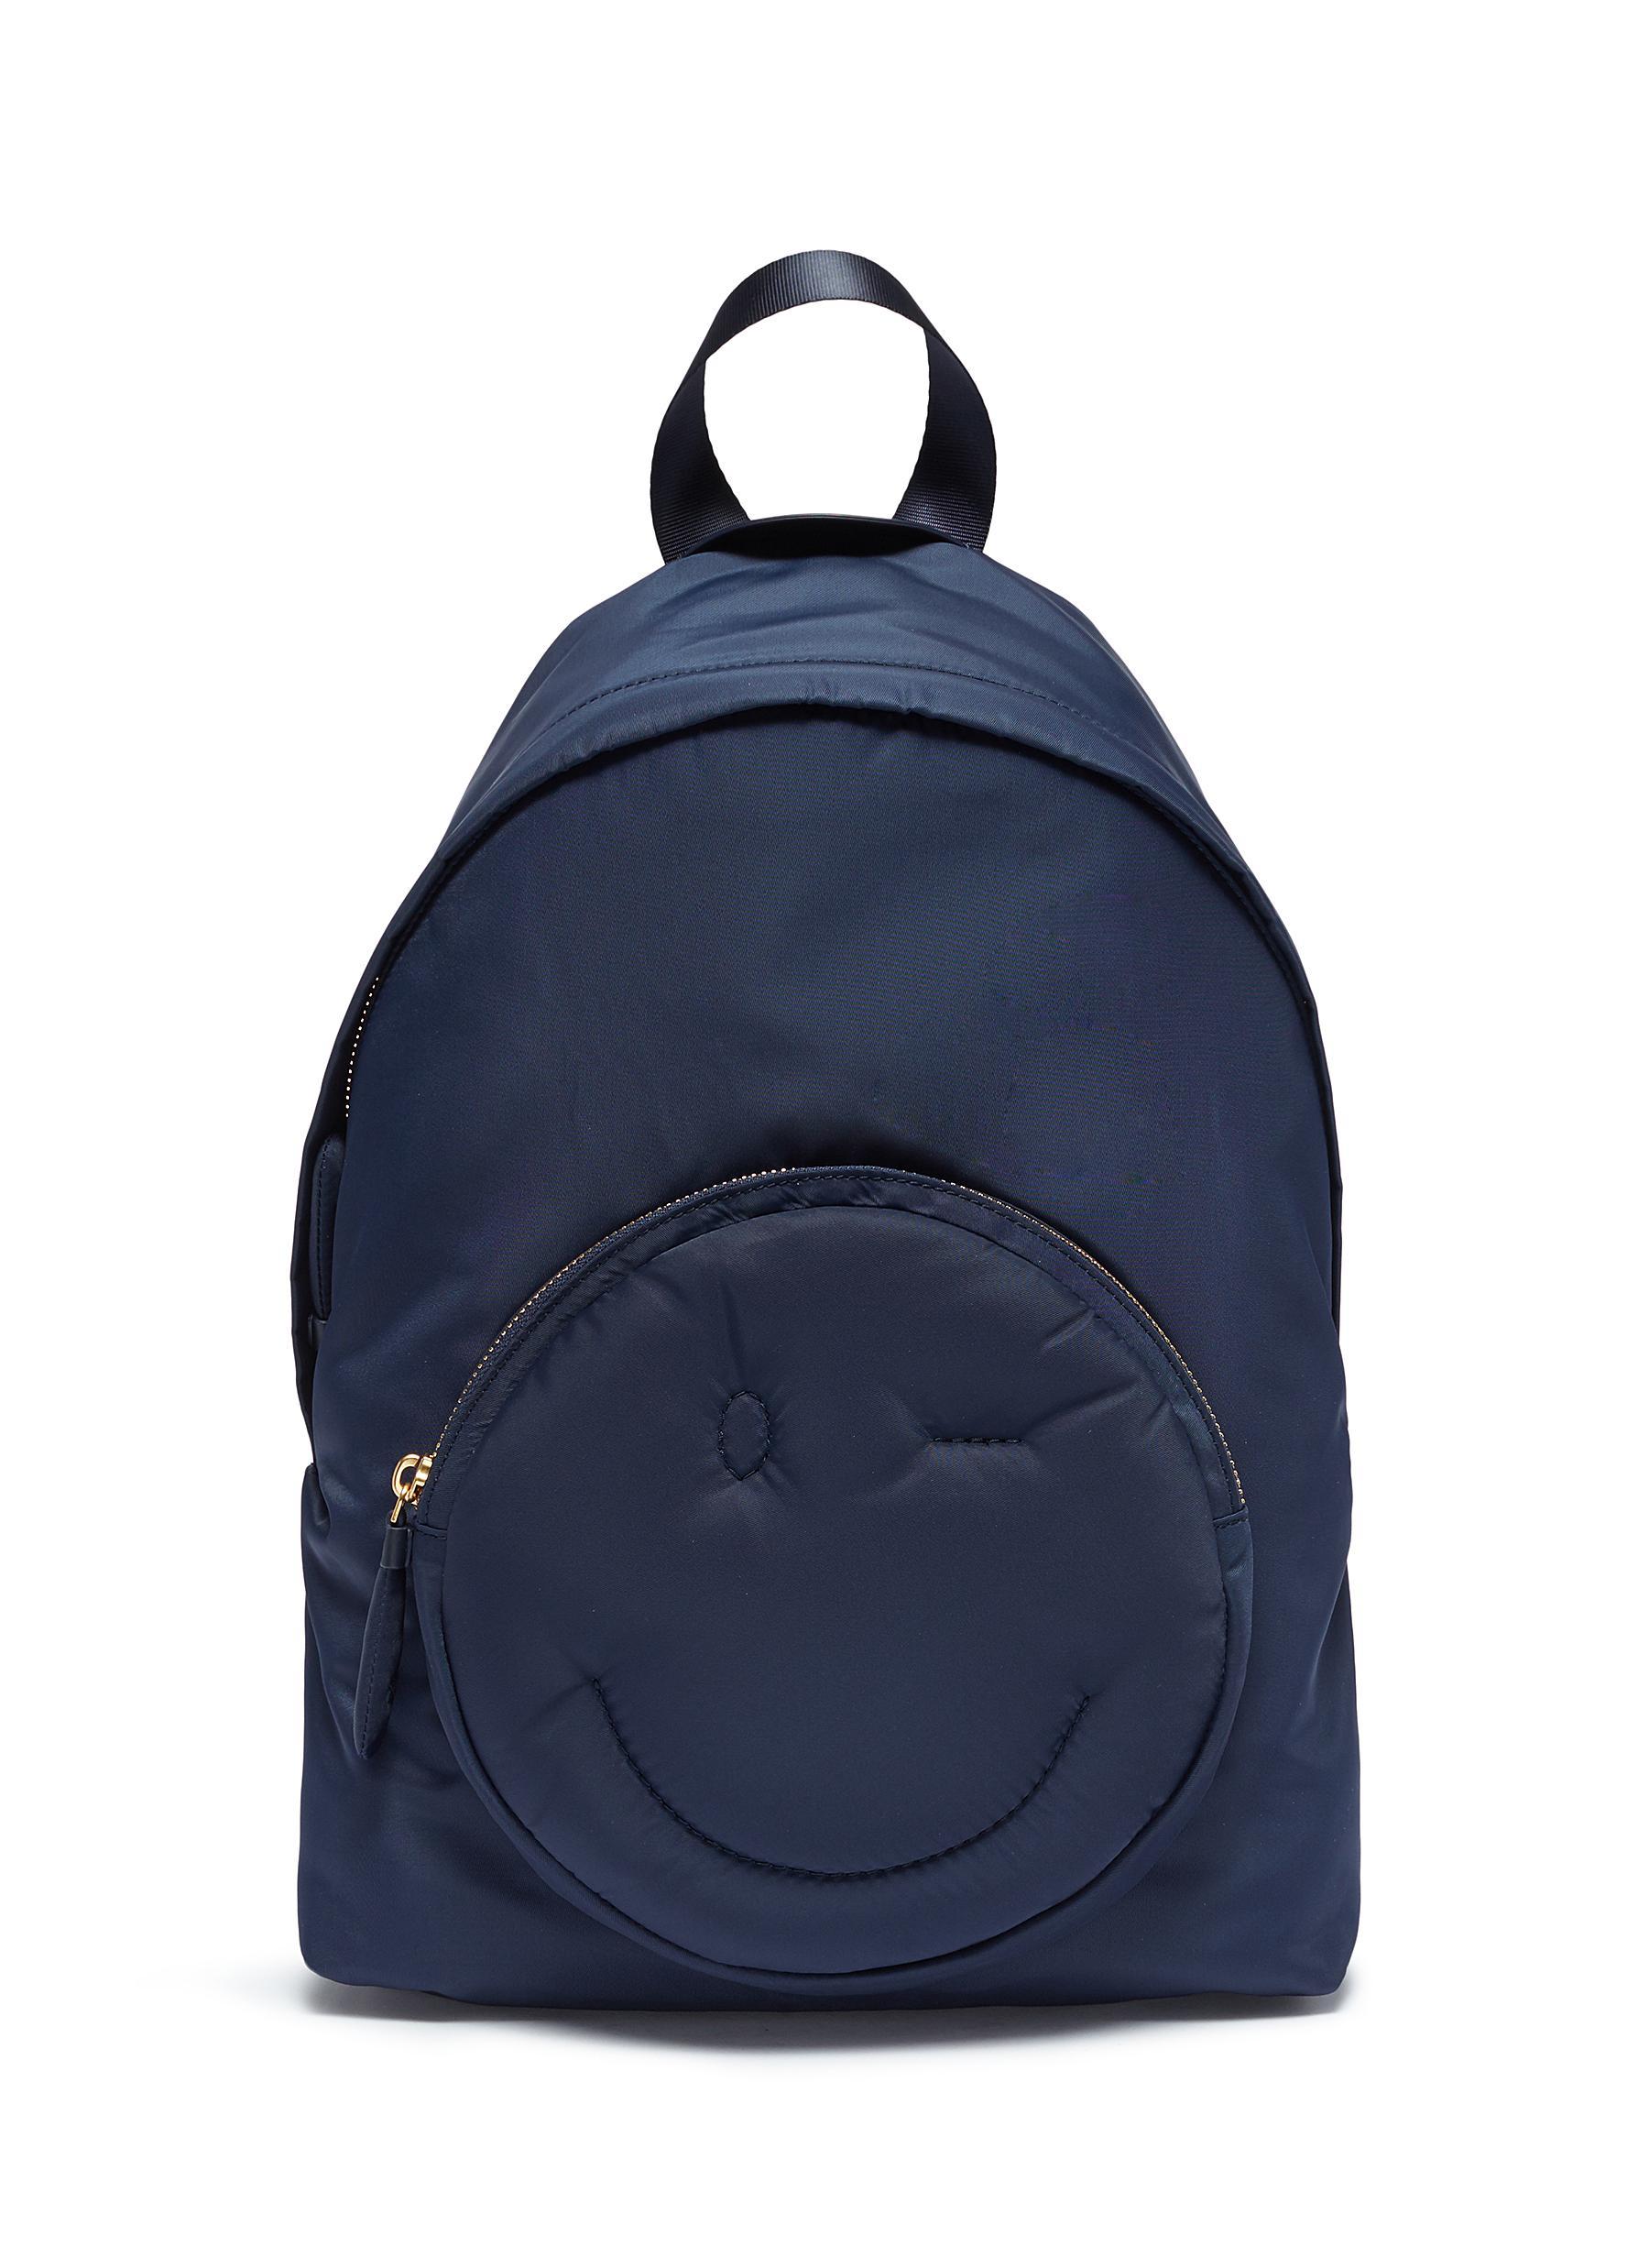 Chubby Wink nylon backpack Anya Hindmarch ChrPY